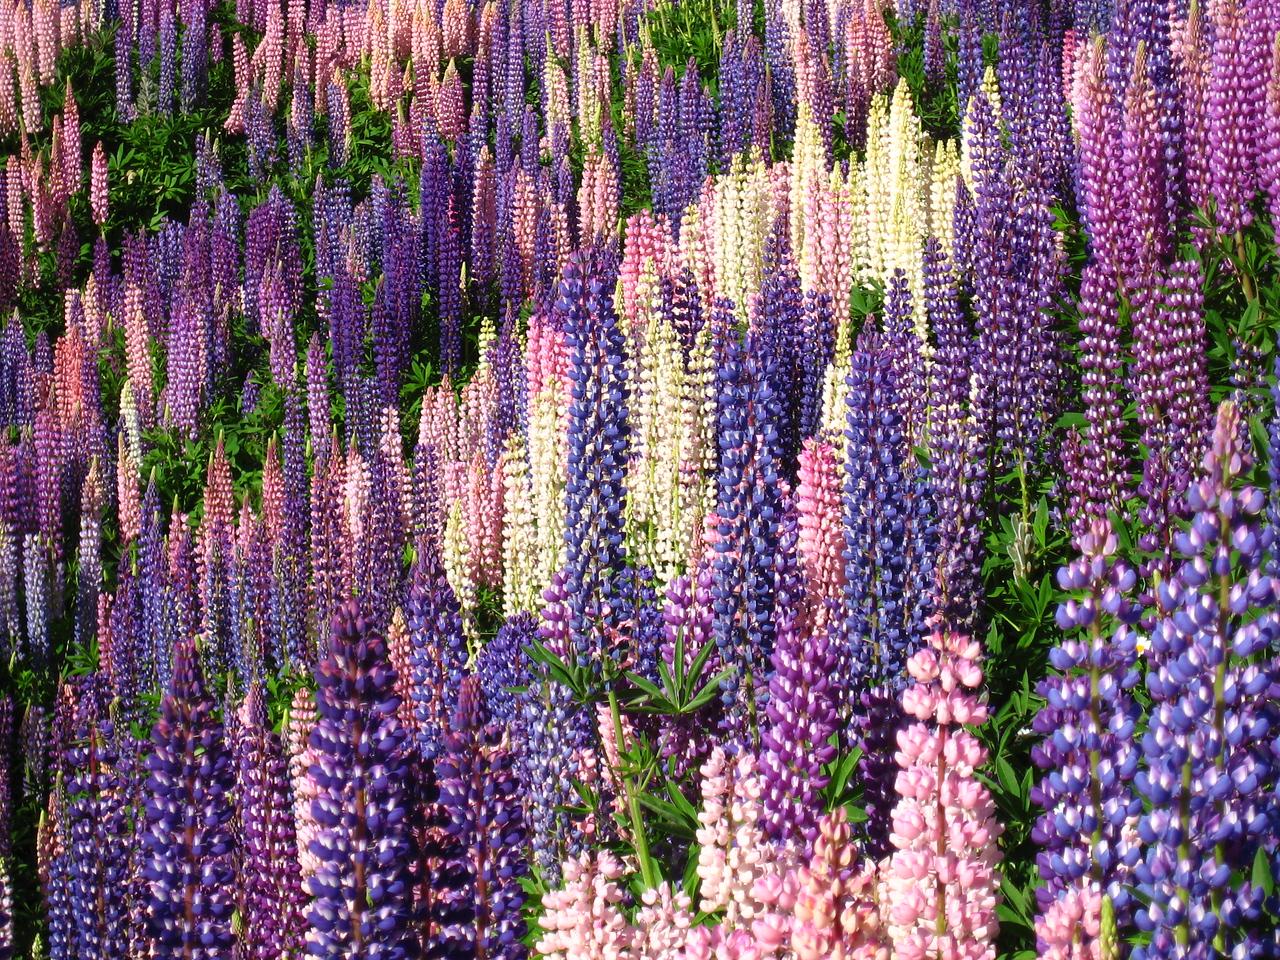 Lupins near Bariloche, Argentina